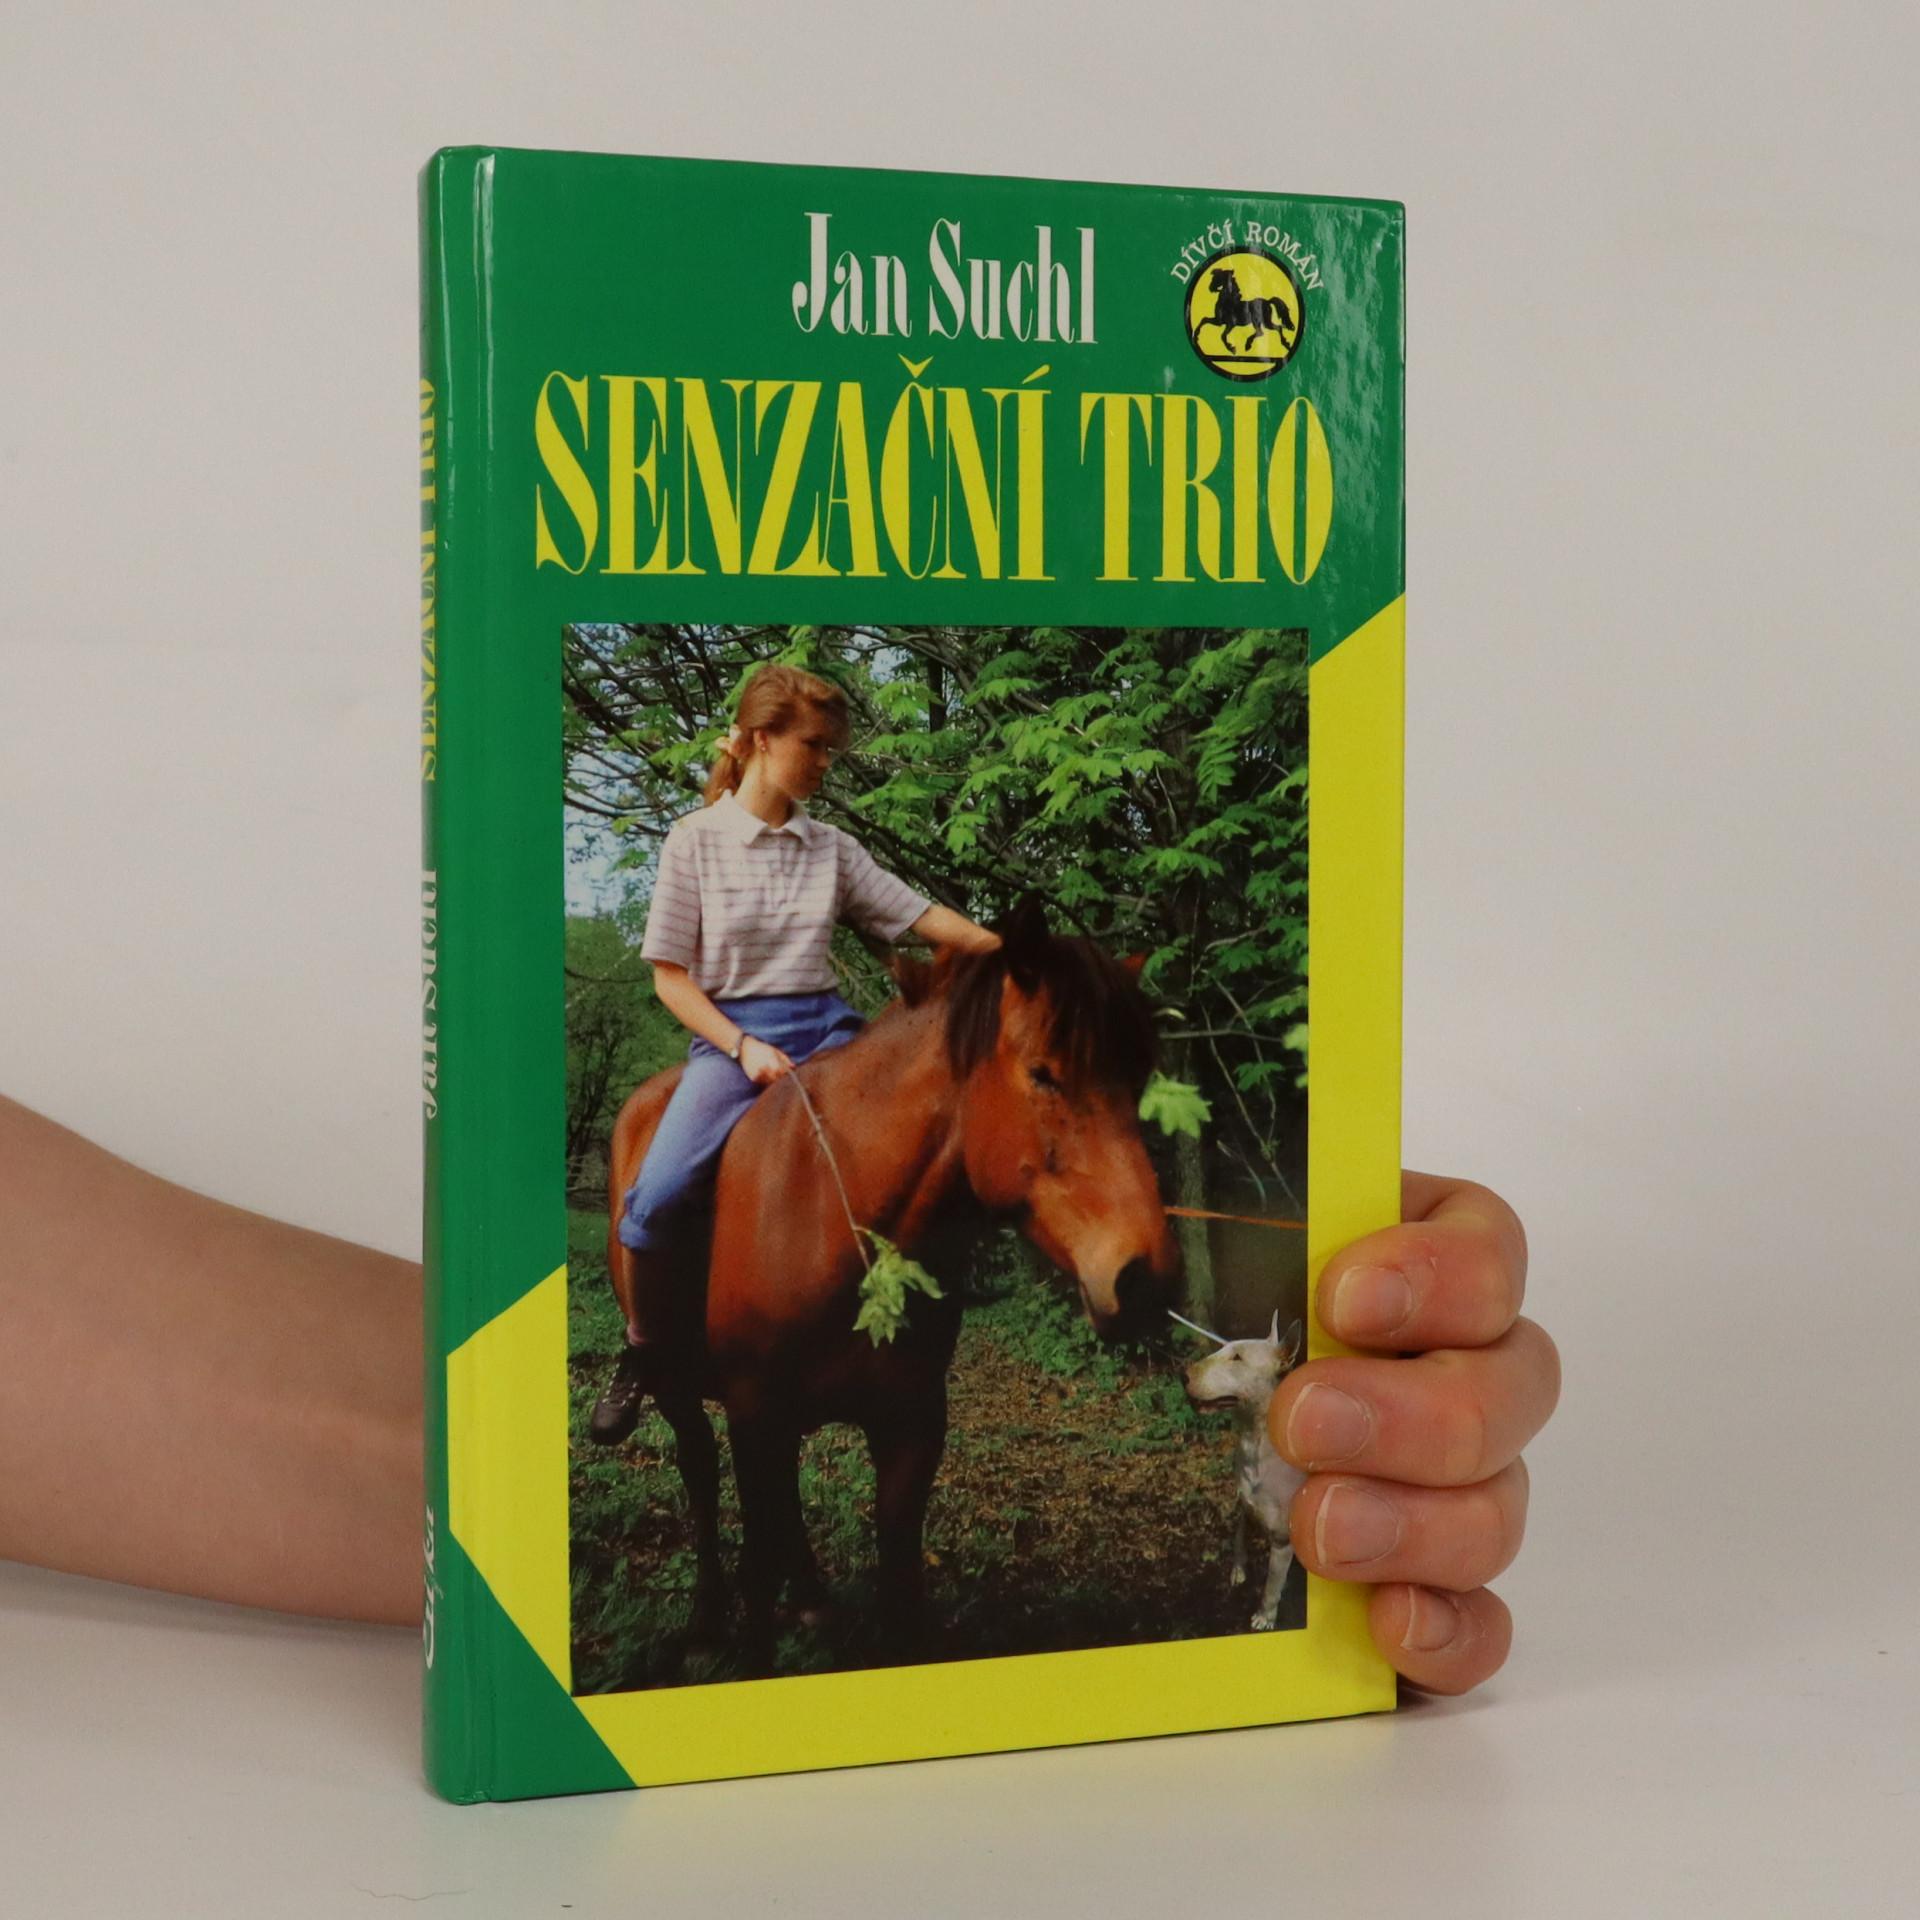 antikvární kniha Senzační trio, 2000